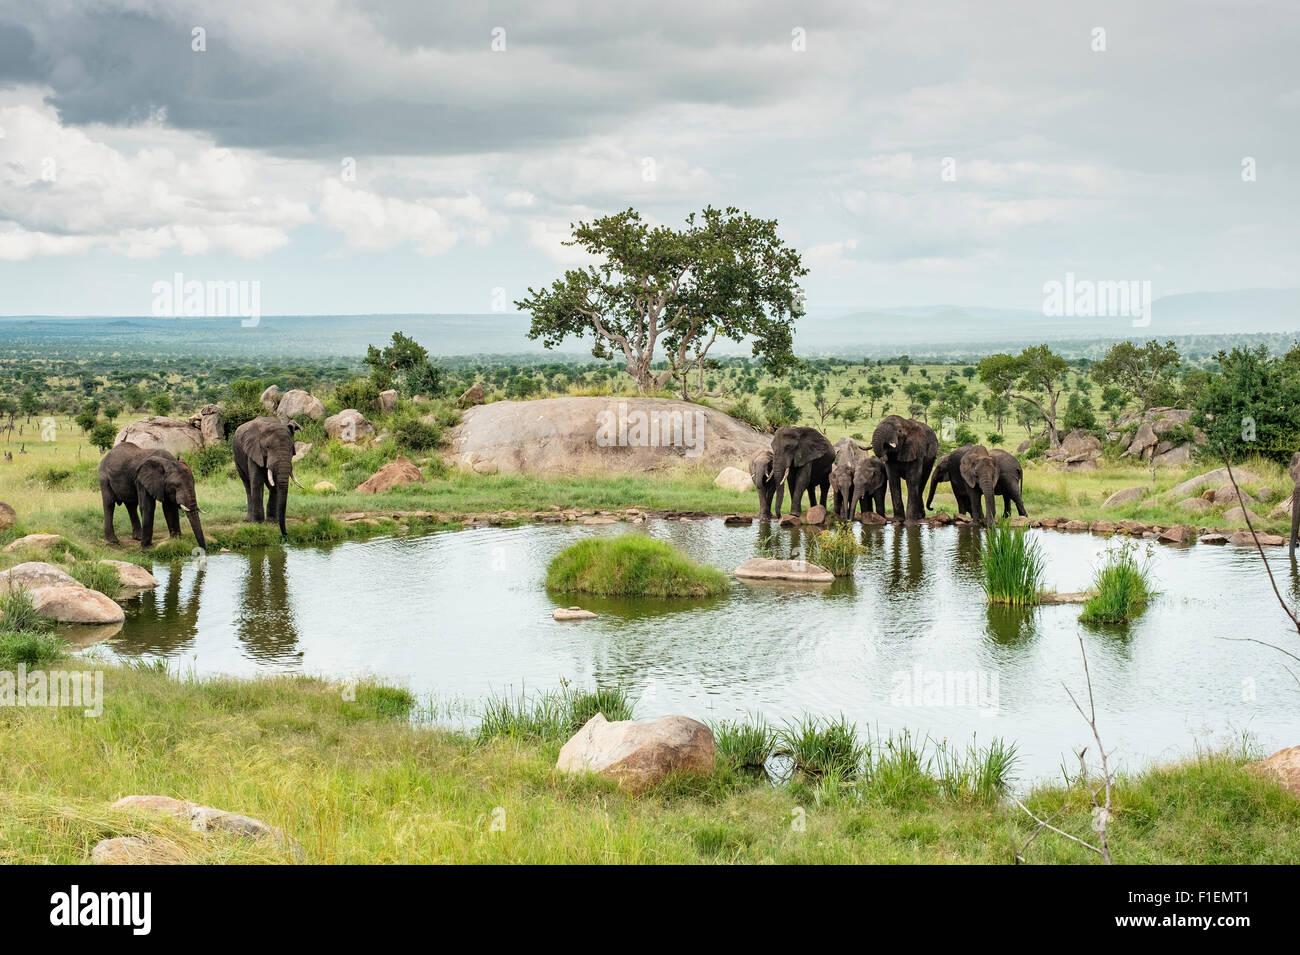 Elephants at watering hole, Serengeti Tanzania - Stock Image